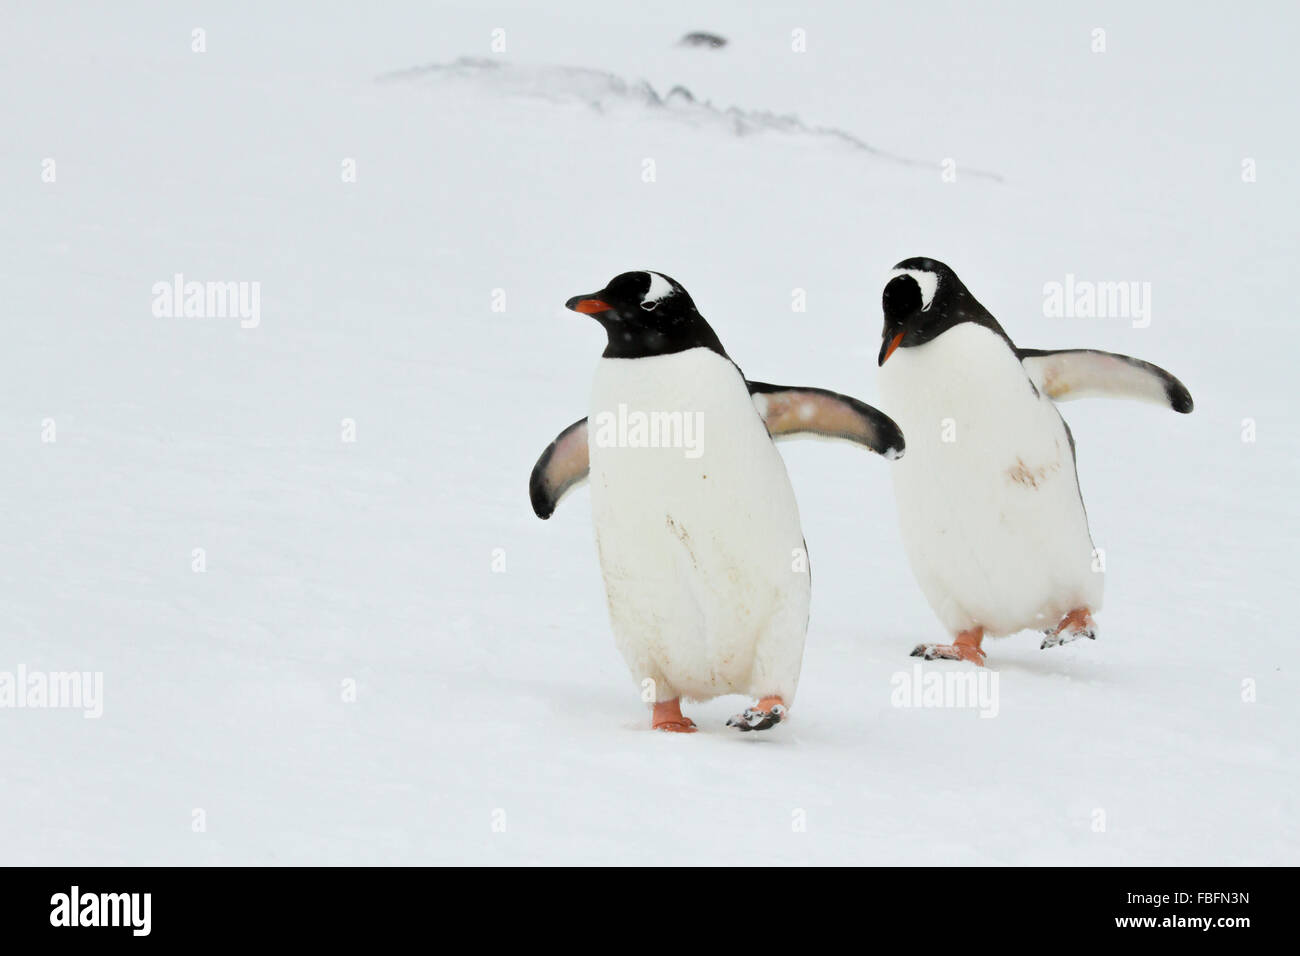 Pair of gentoo penguins on Ronge Island, Antarctica walking in sync step. - Stock Image